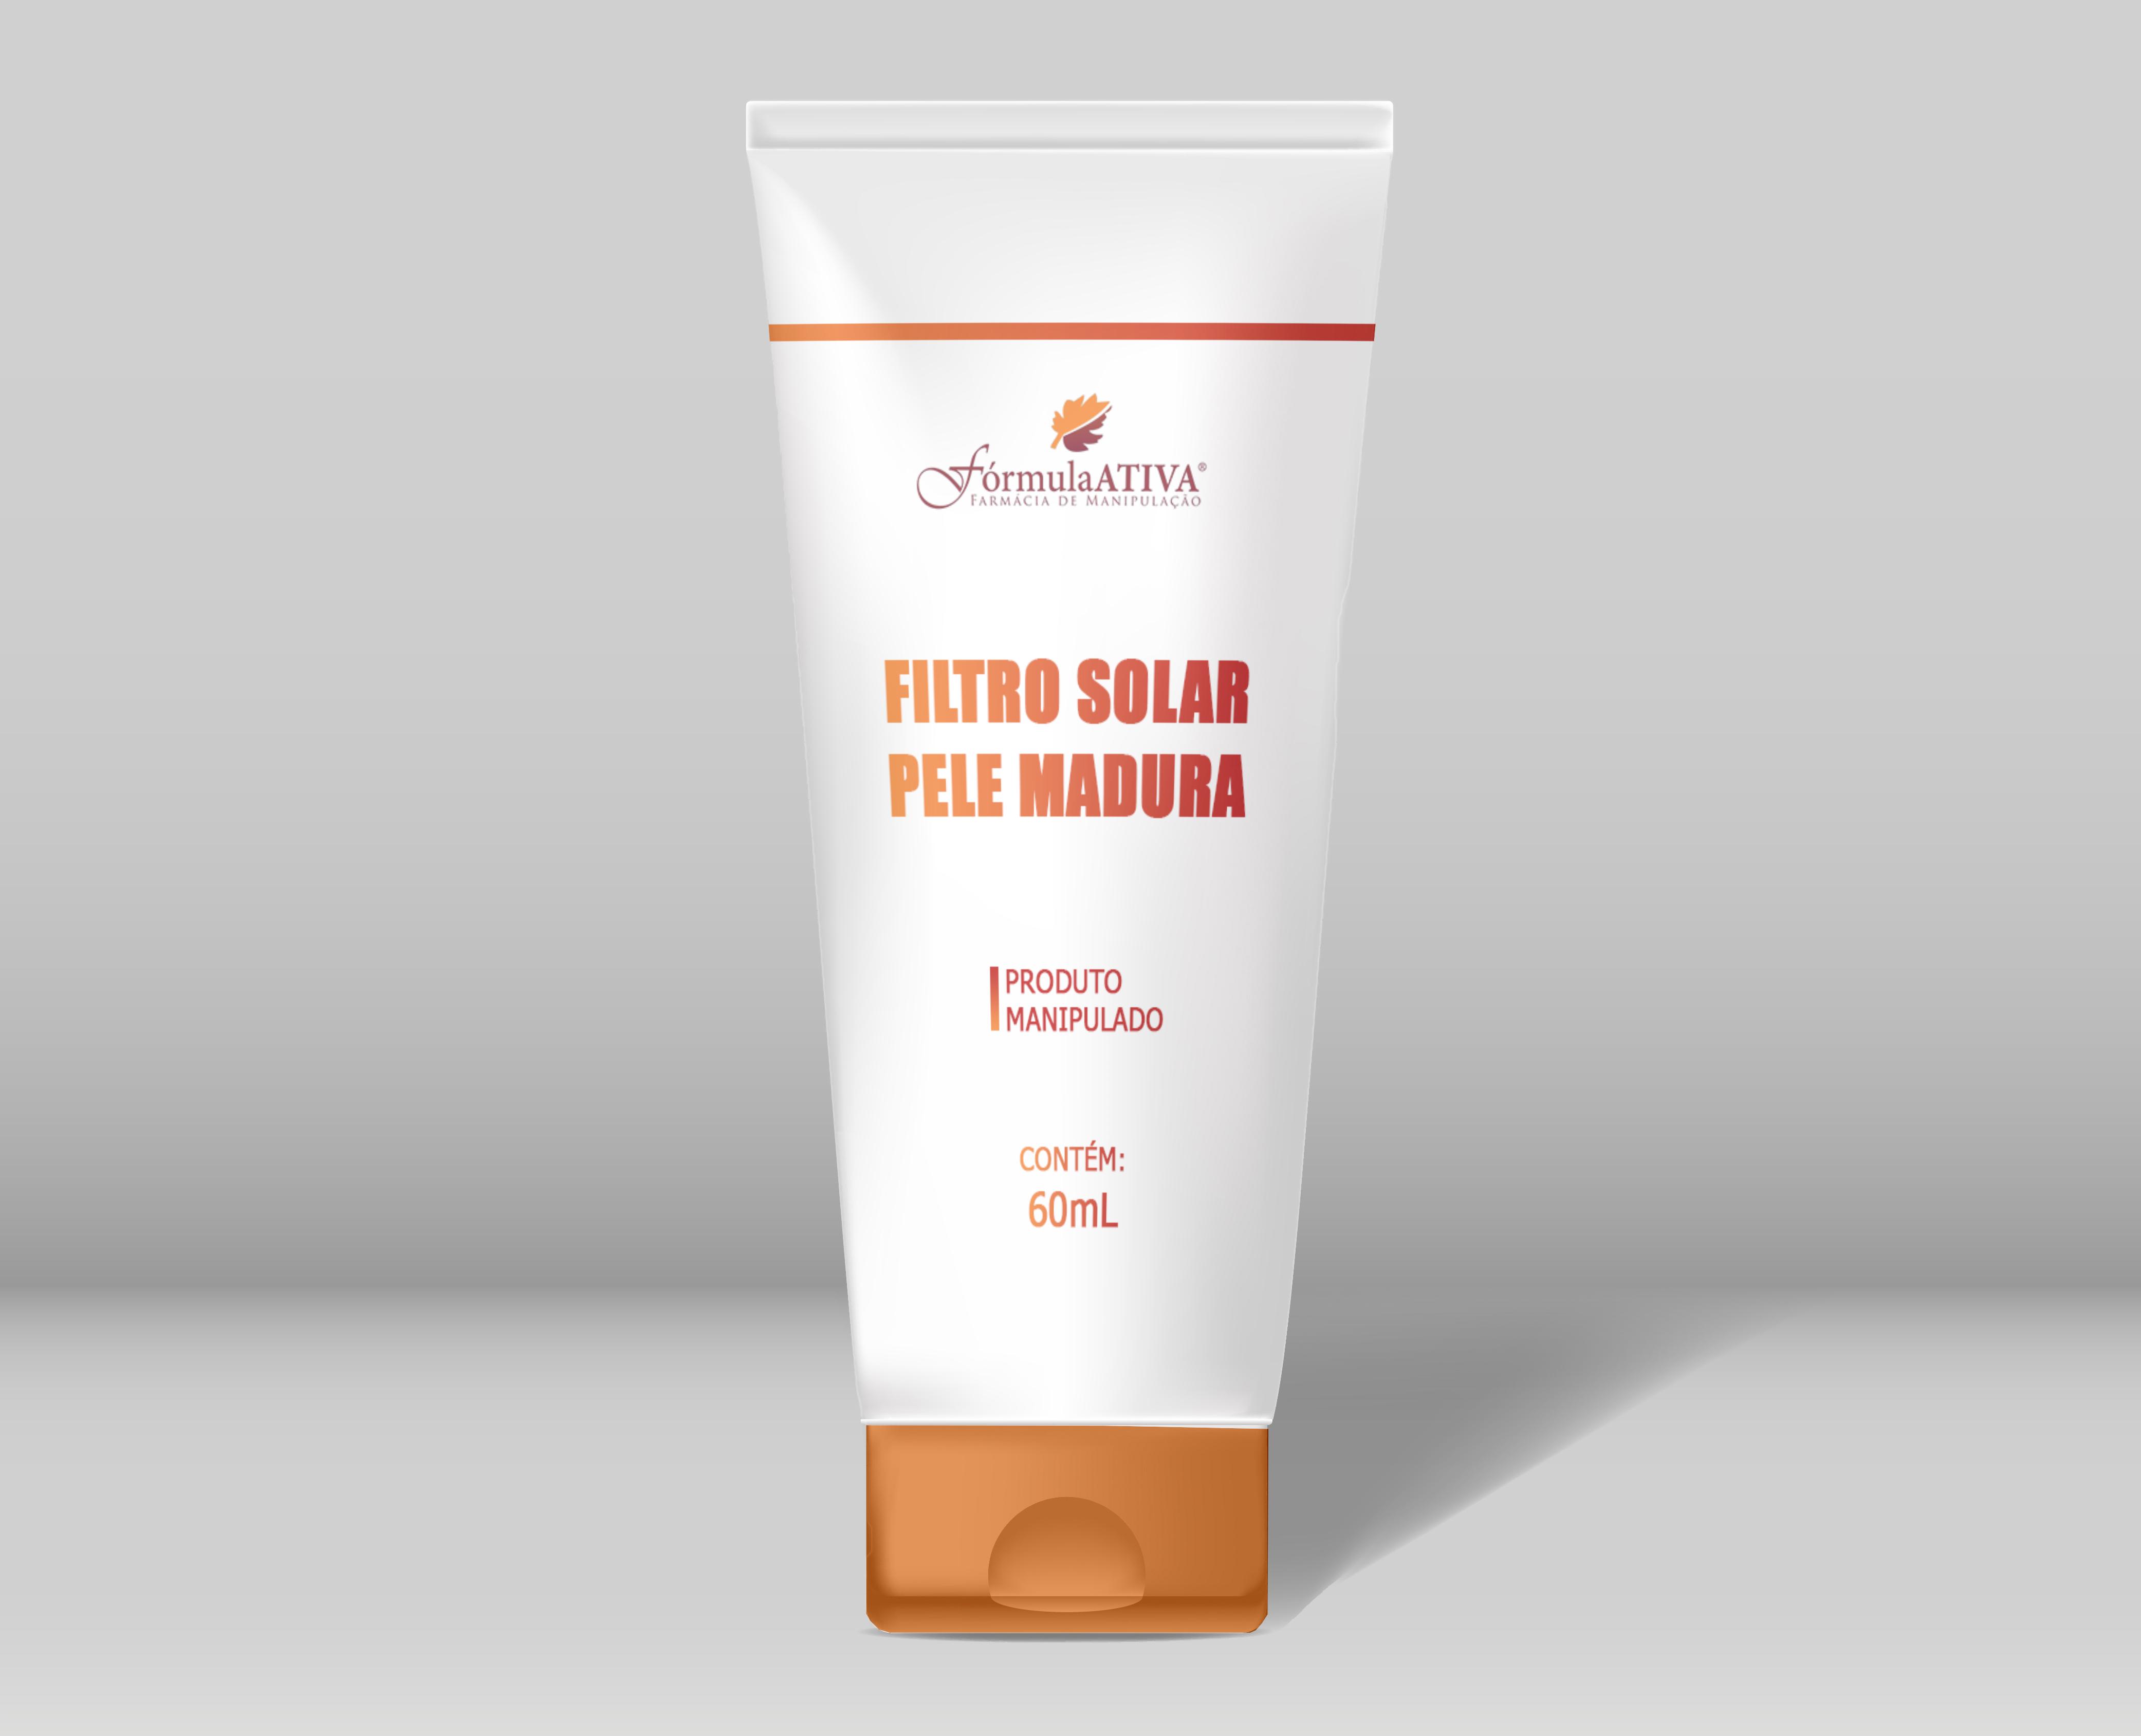 Filtro Solar para Pele Madura (FPS 50 - 60g)